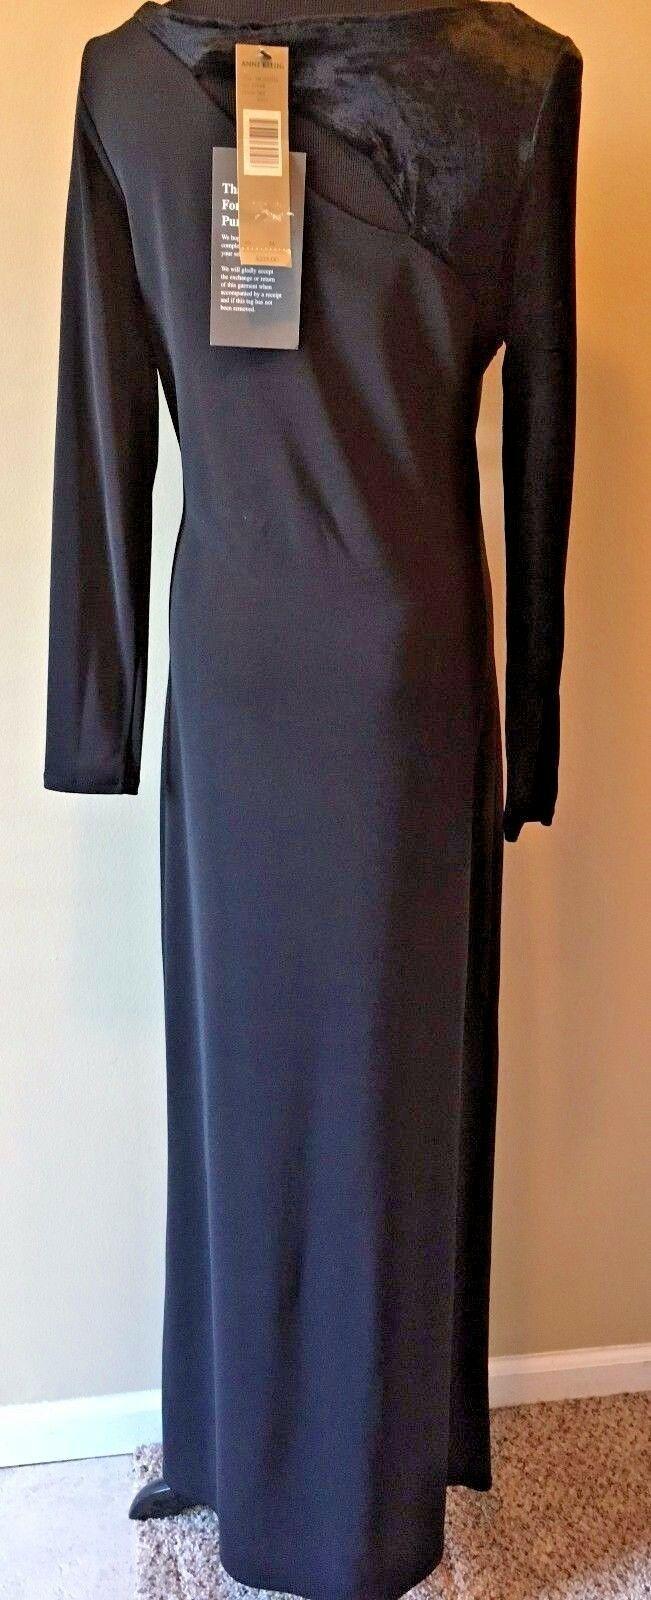 Anne Klein Black Velvet & Rayon Cutout Long Formal Dress size S M NWT $225 DS7 image 5